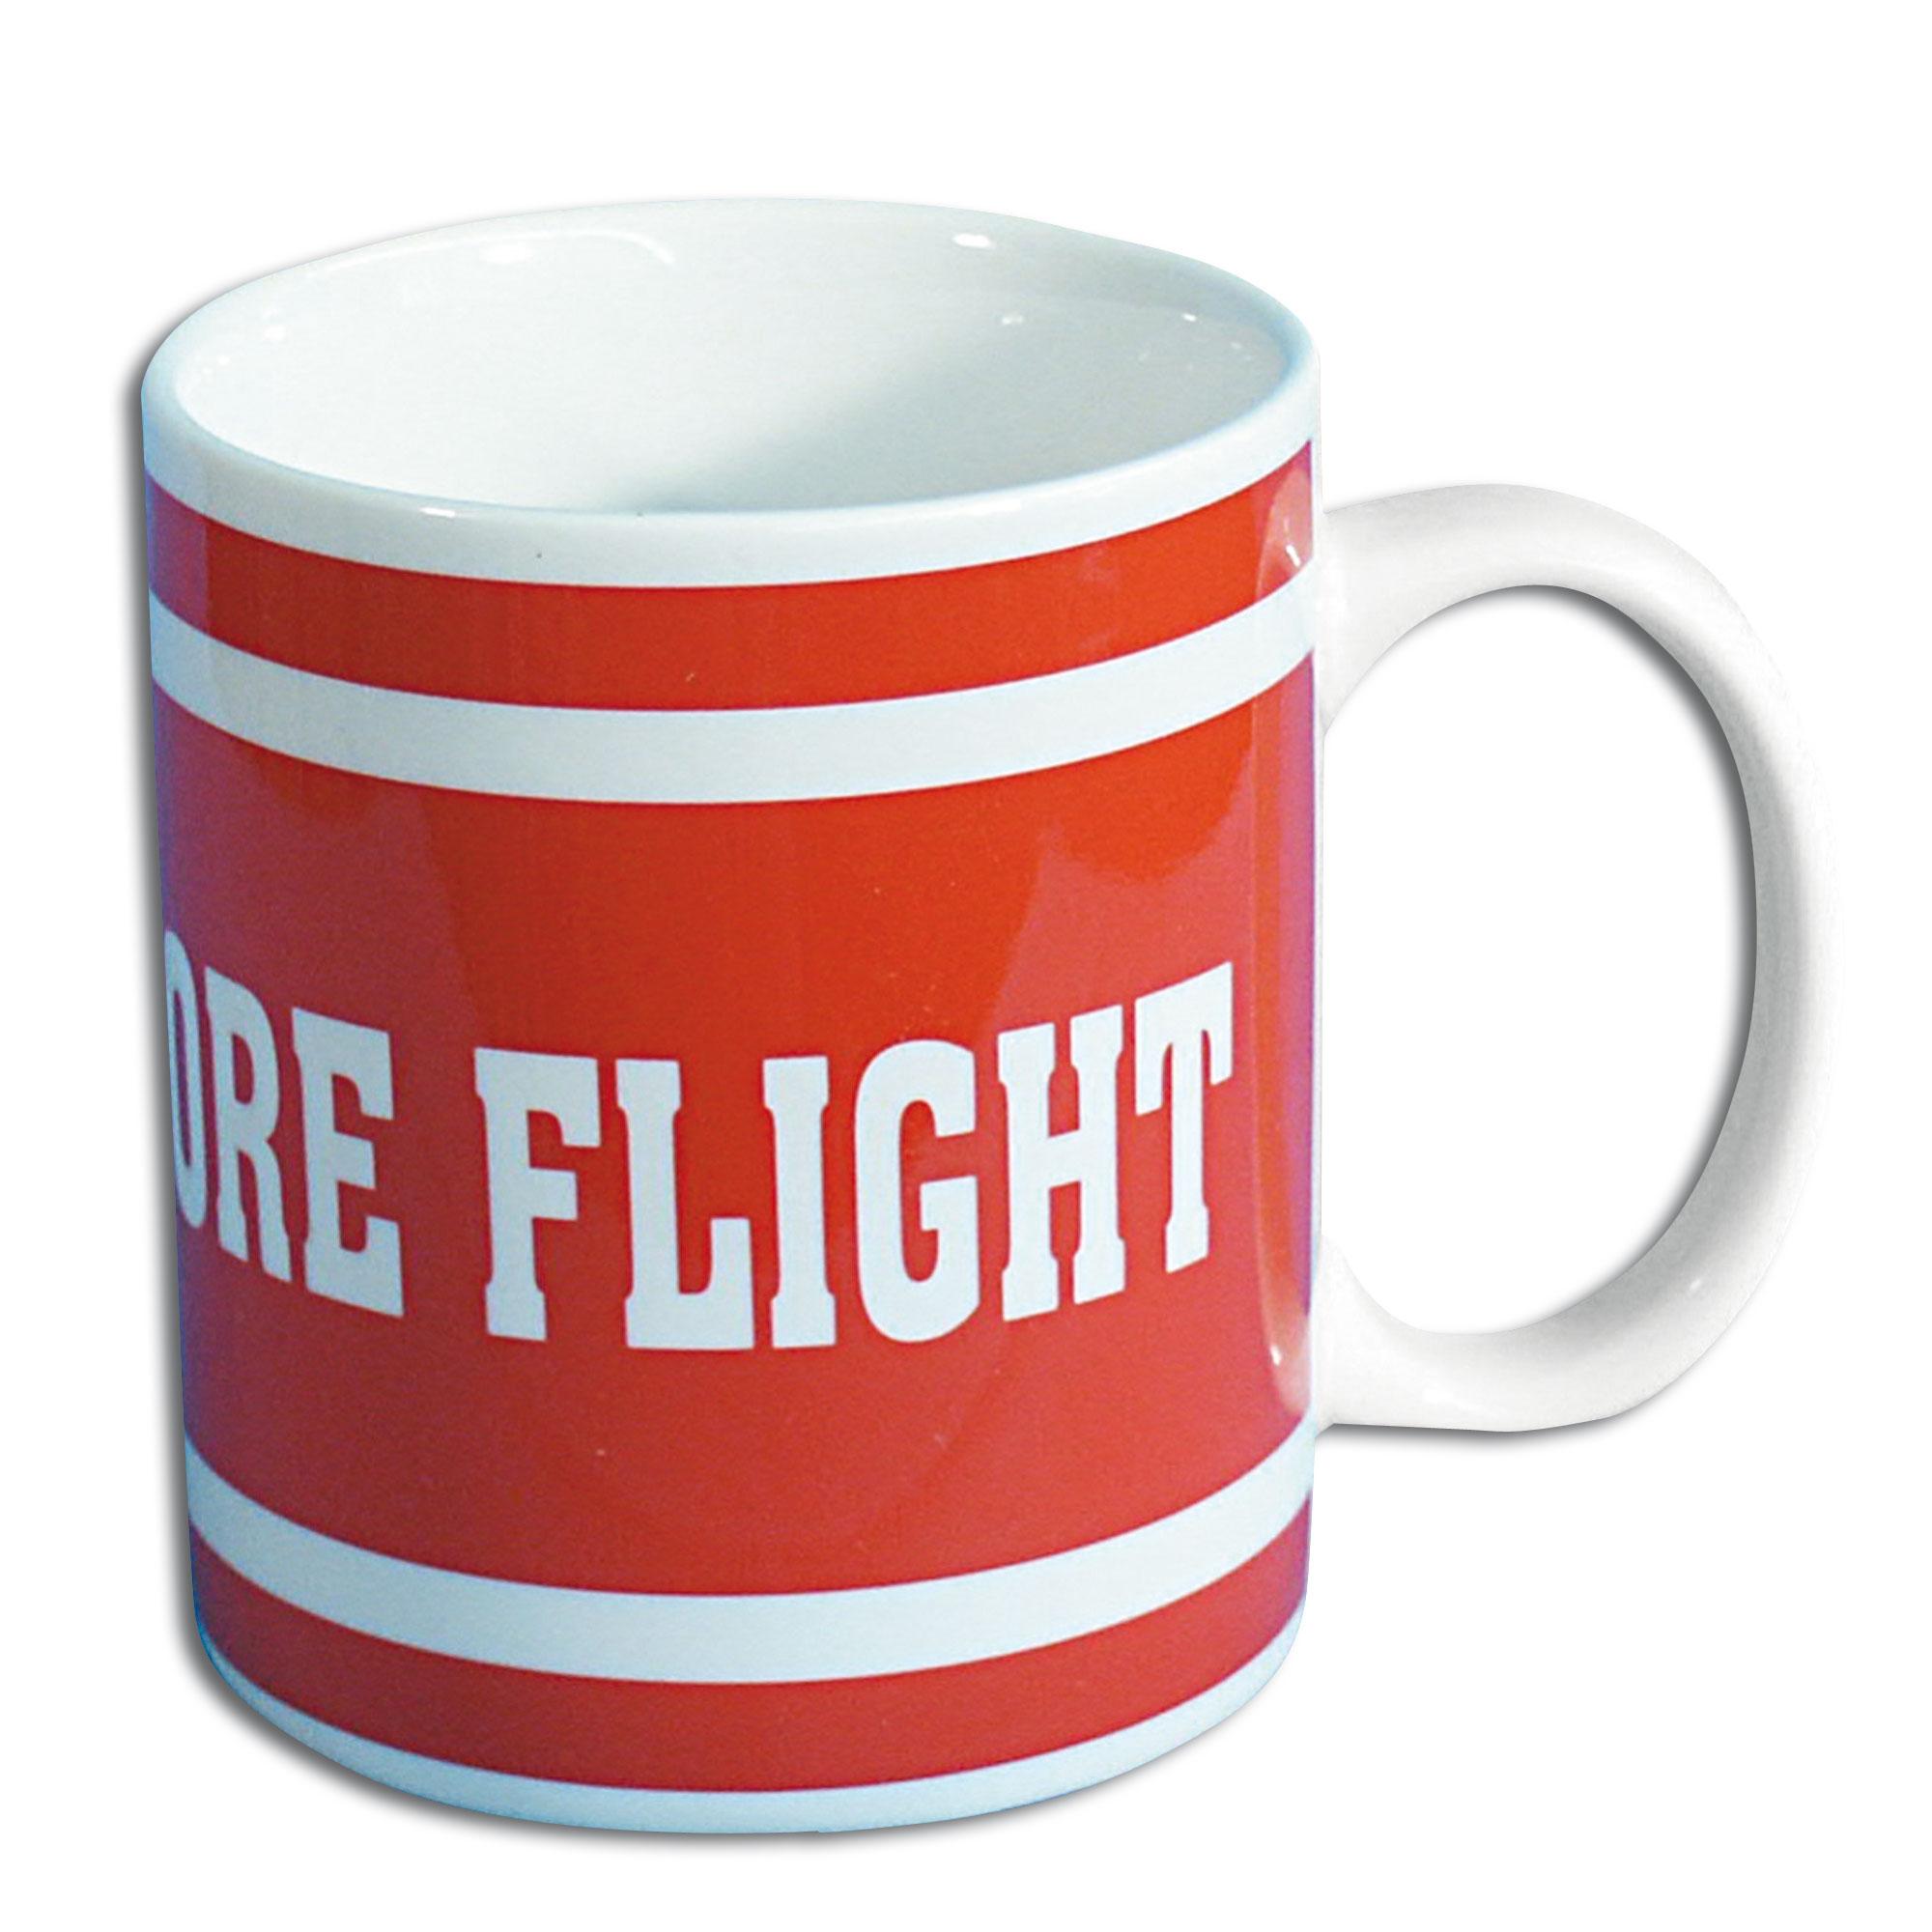 Tasse Remove before Flight